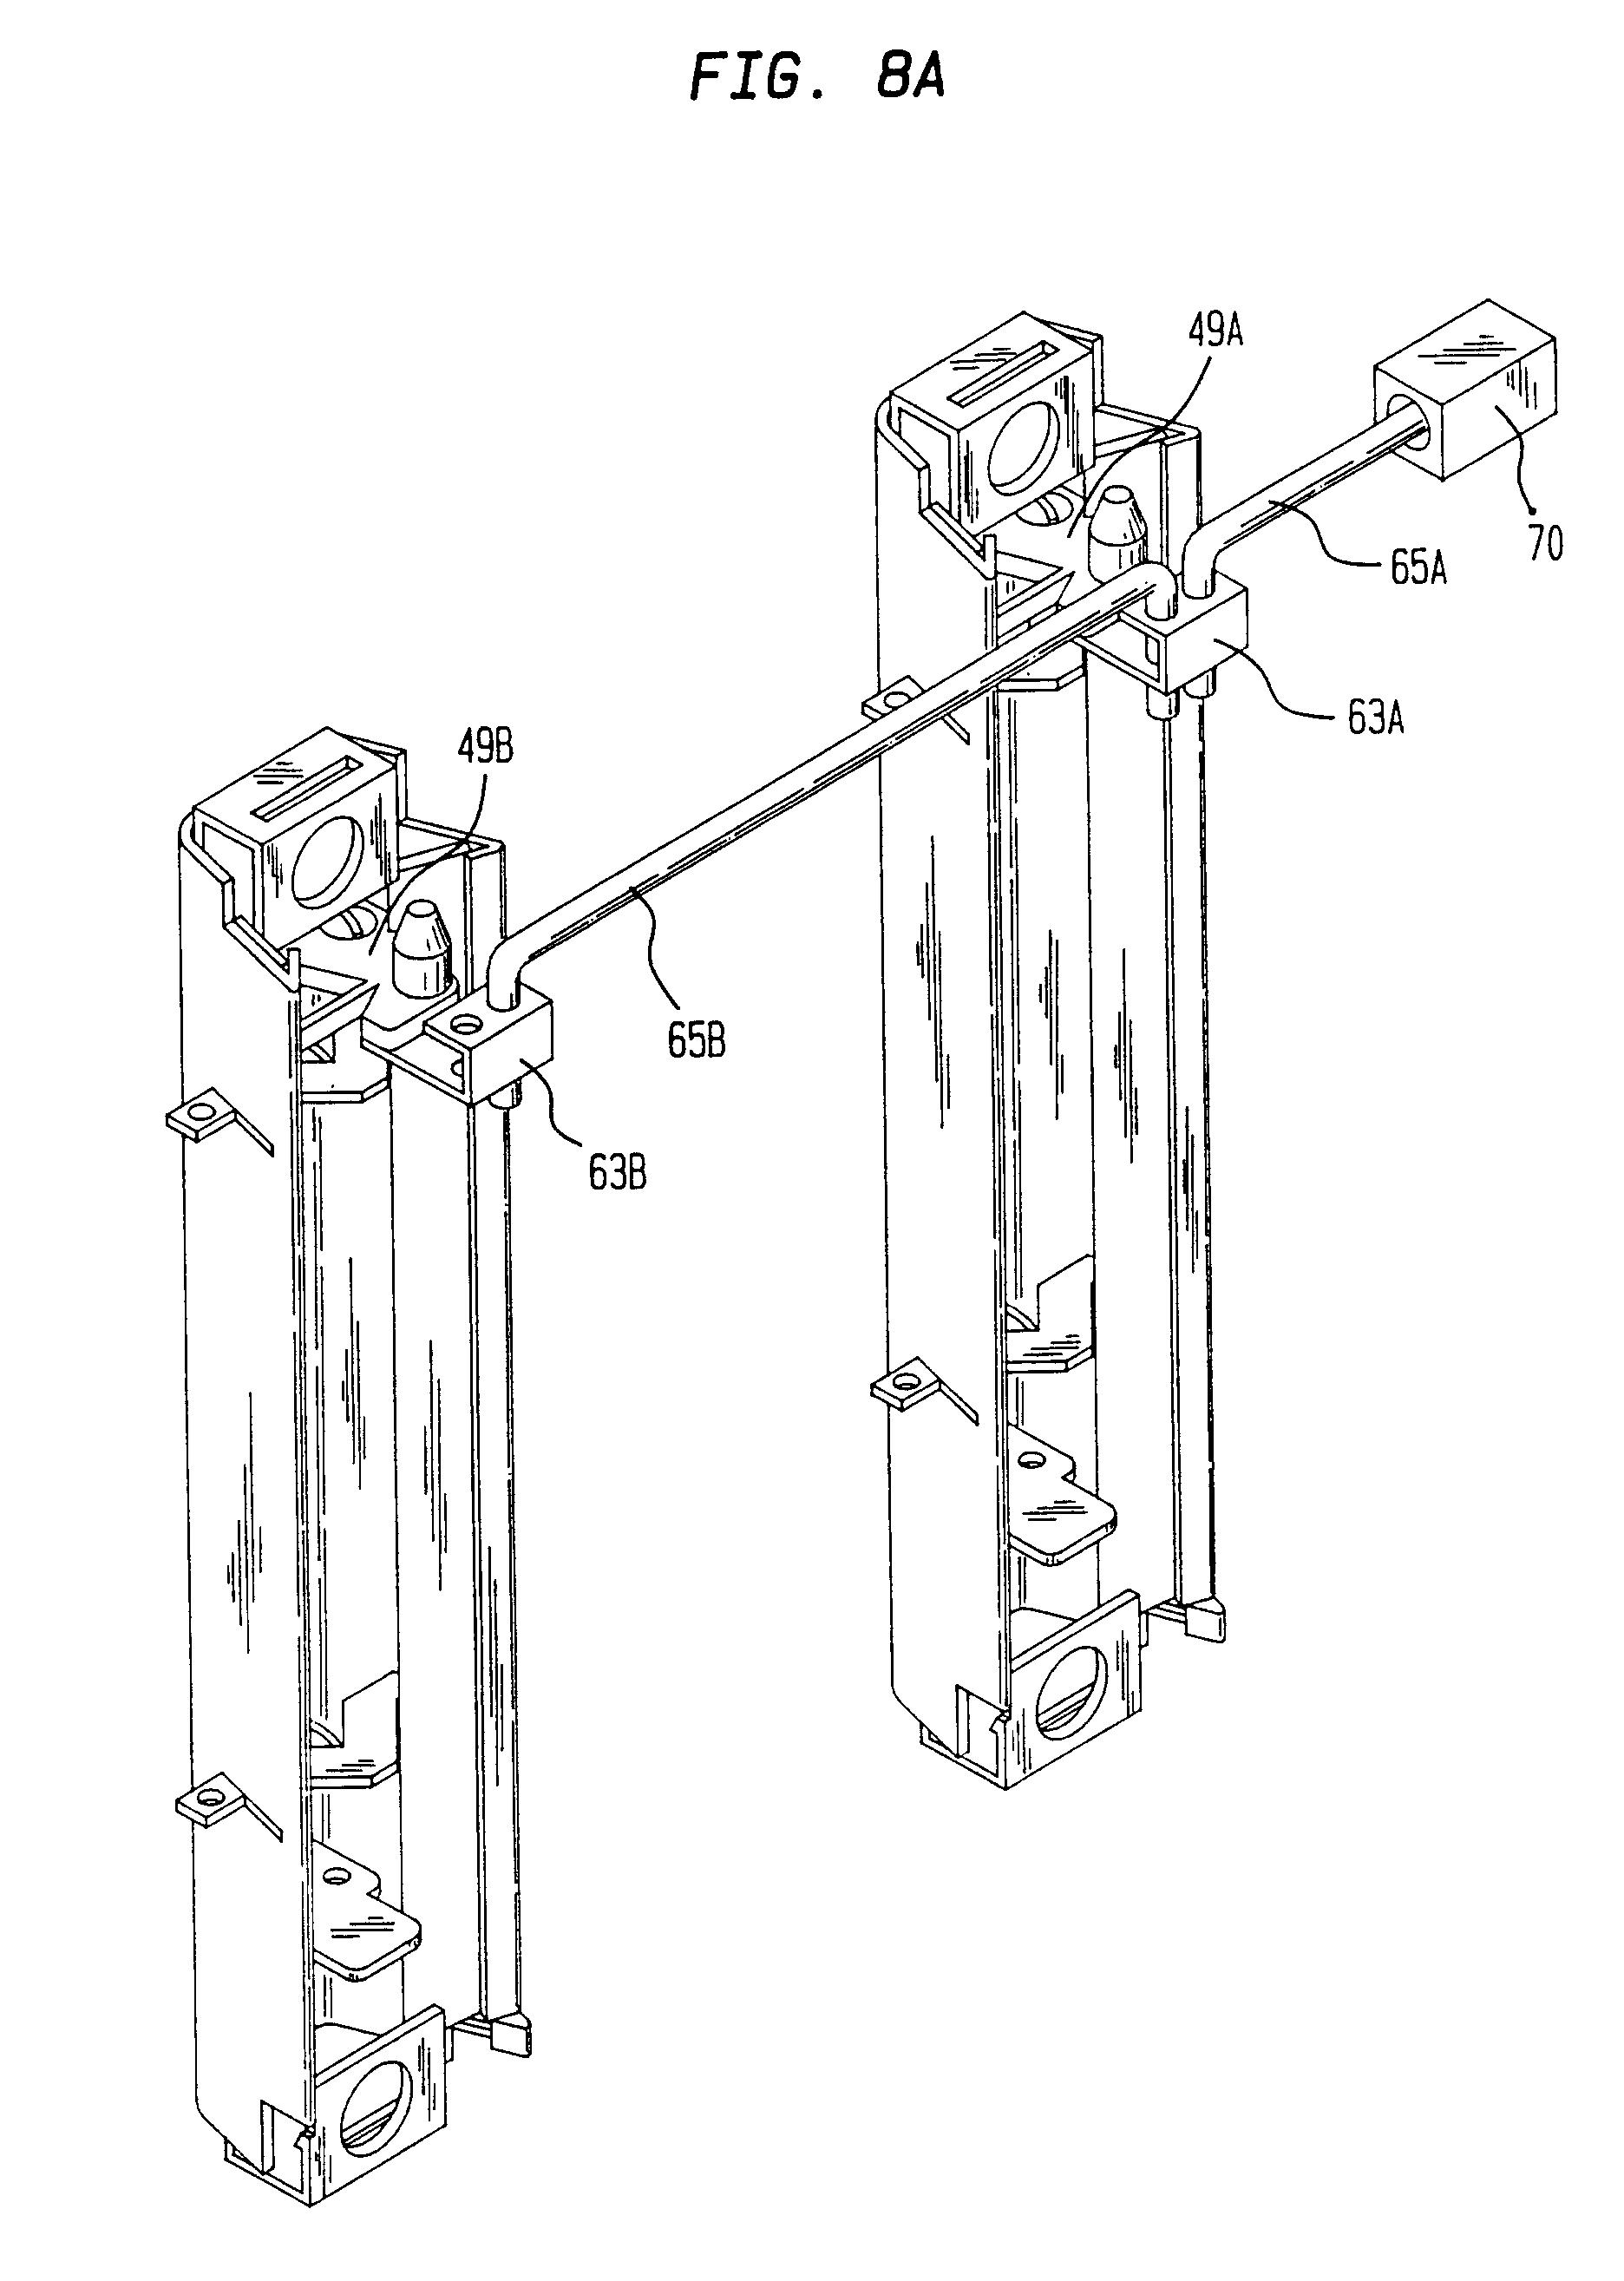 Patent EP0755478B1 - Cabinet drawer interlocking system - Google ...